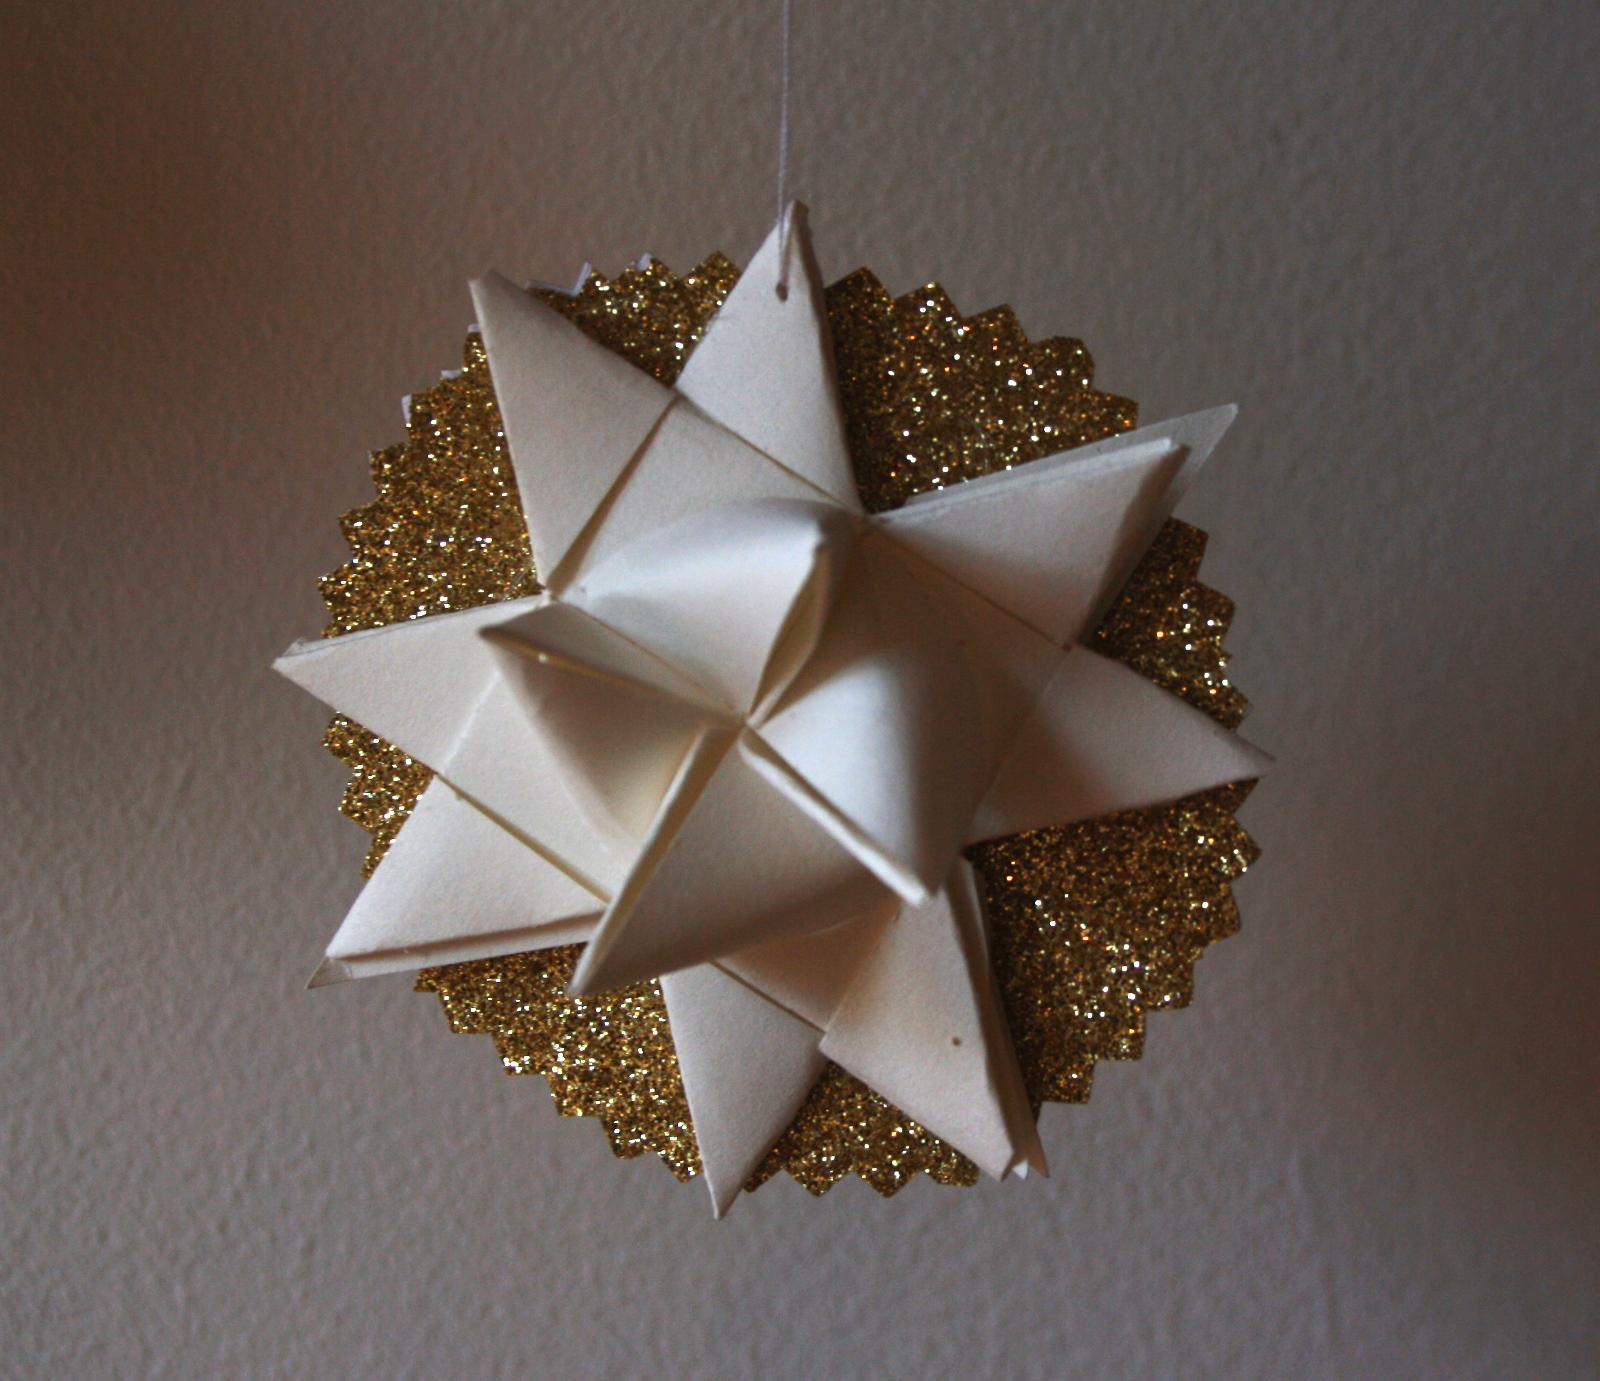 Maries stjerne